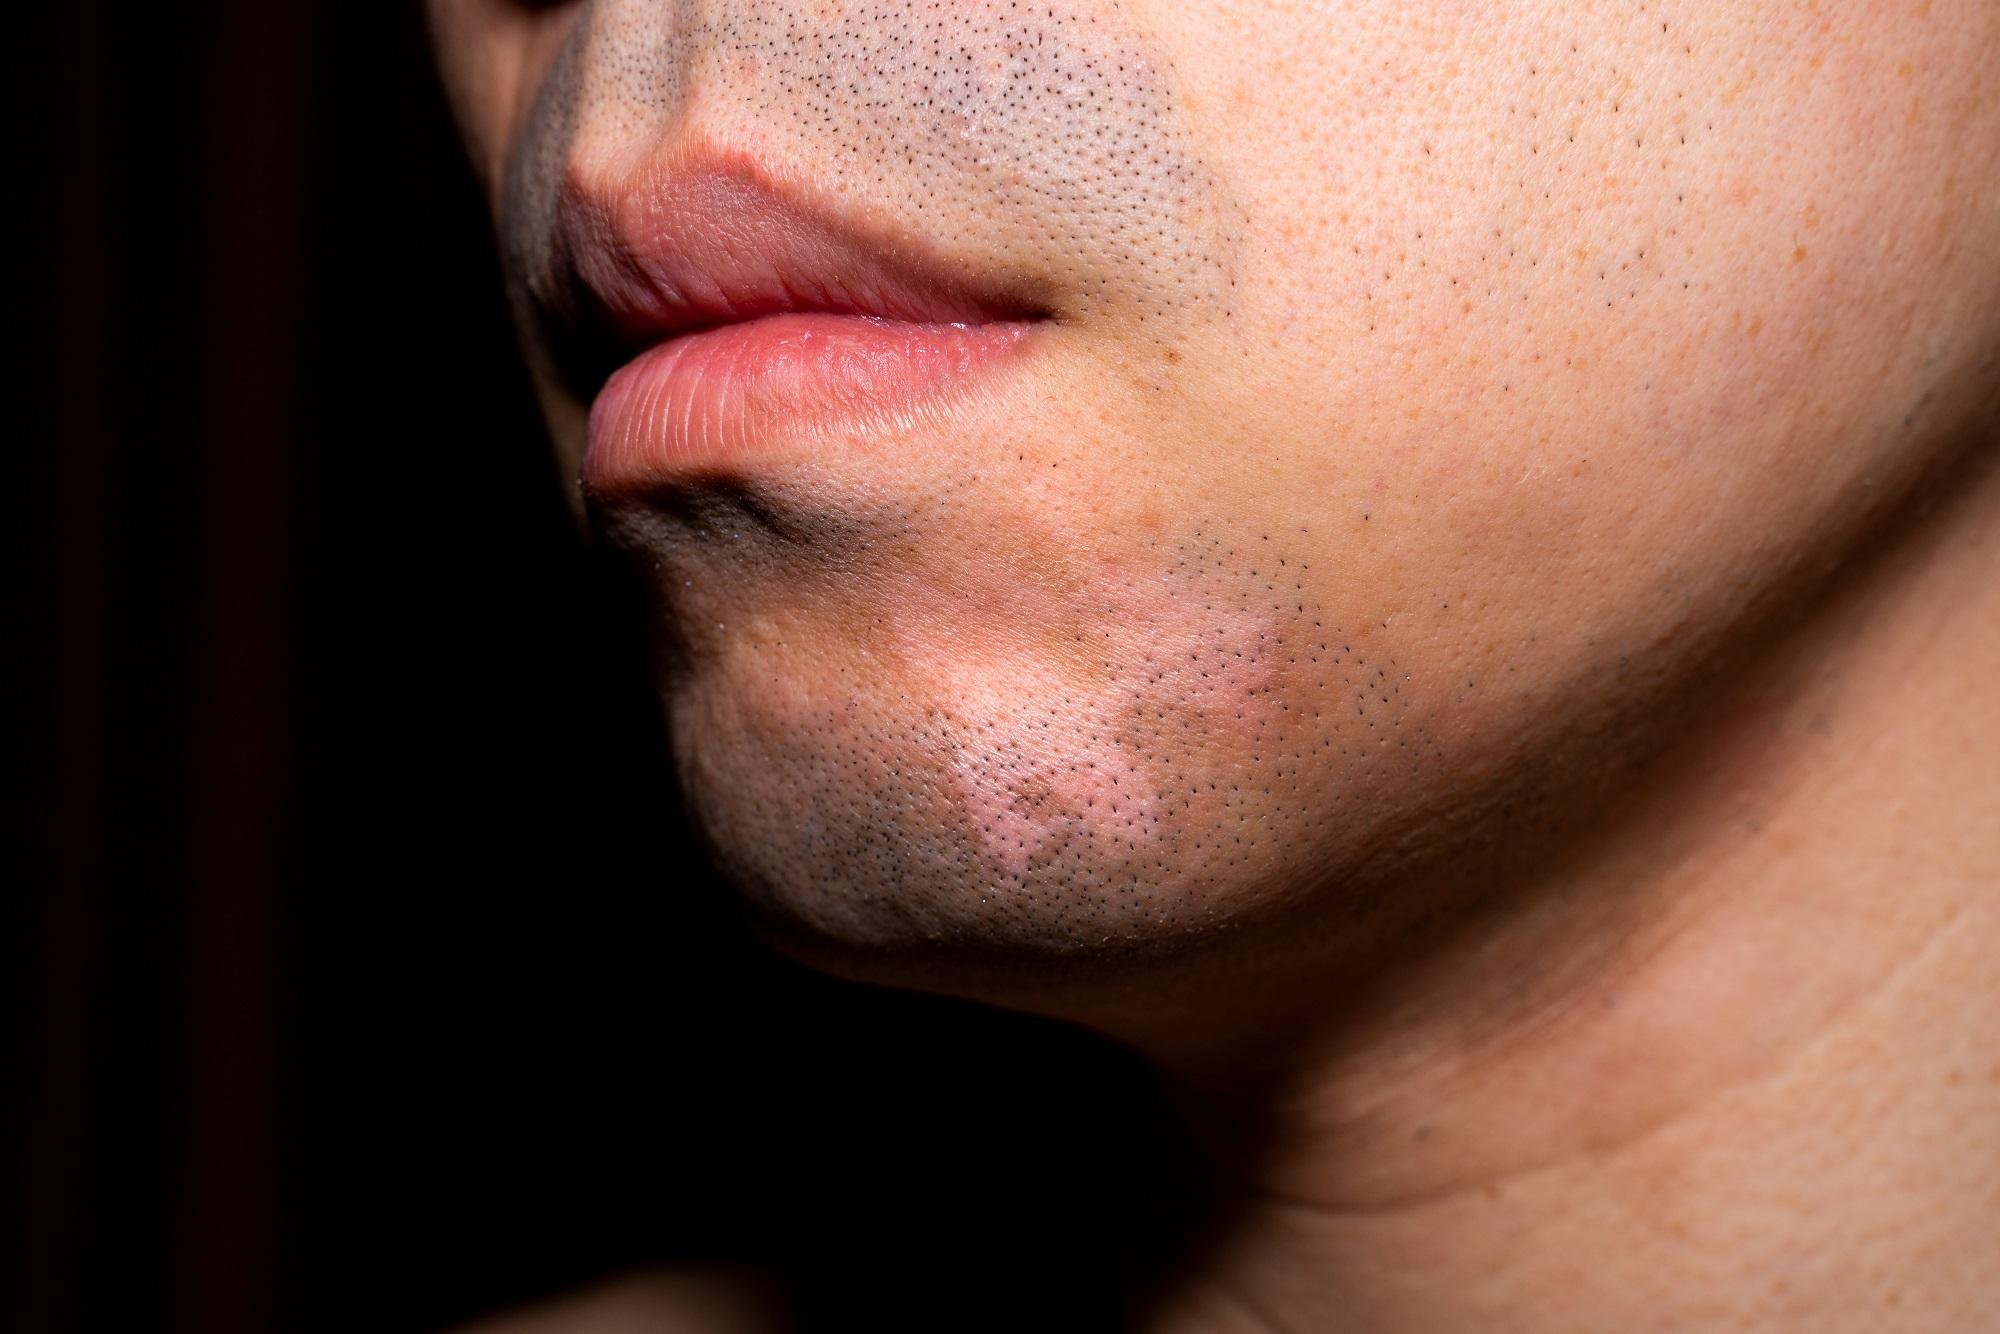 Twice Daily 2 Tofacitinib Cream Plus Uvb Improves Facial Vitiligo Symptoms Dermatology Advisor